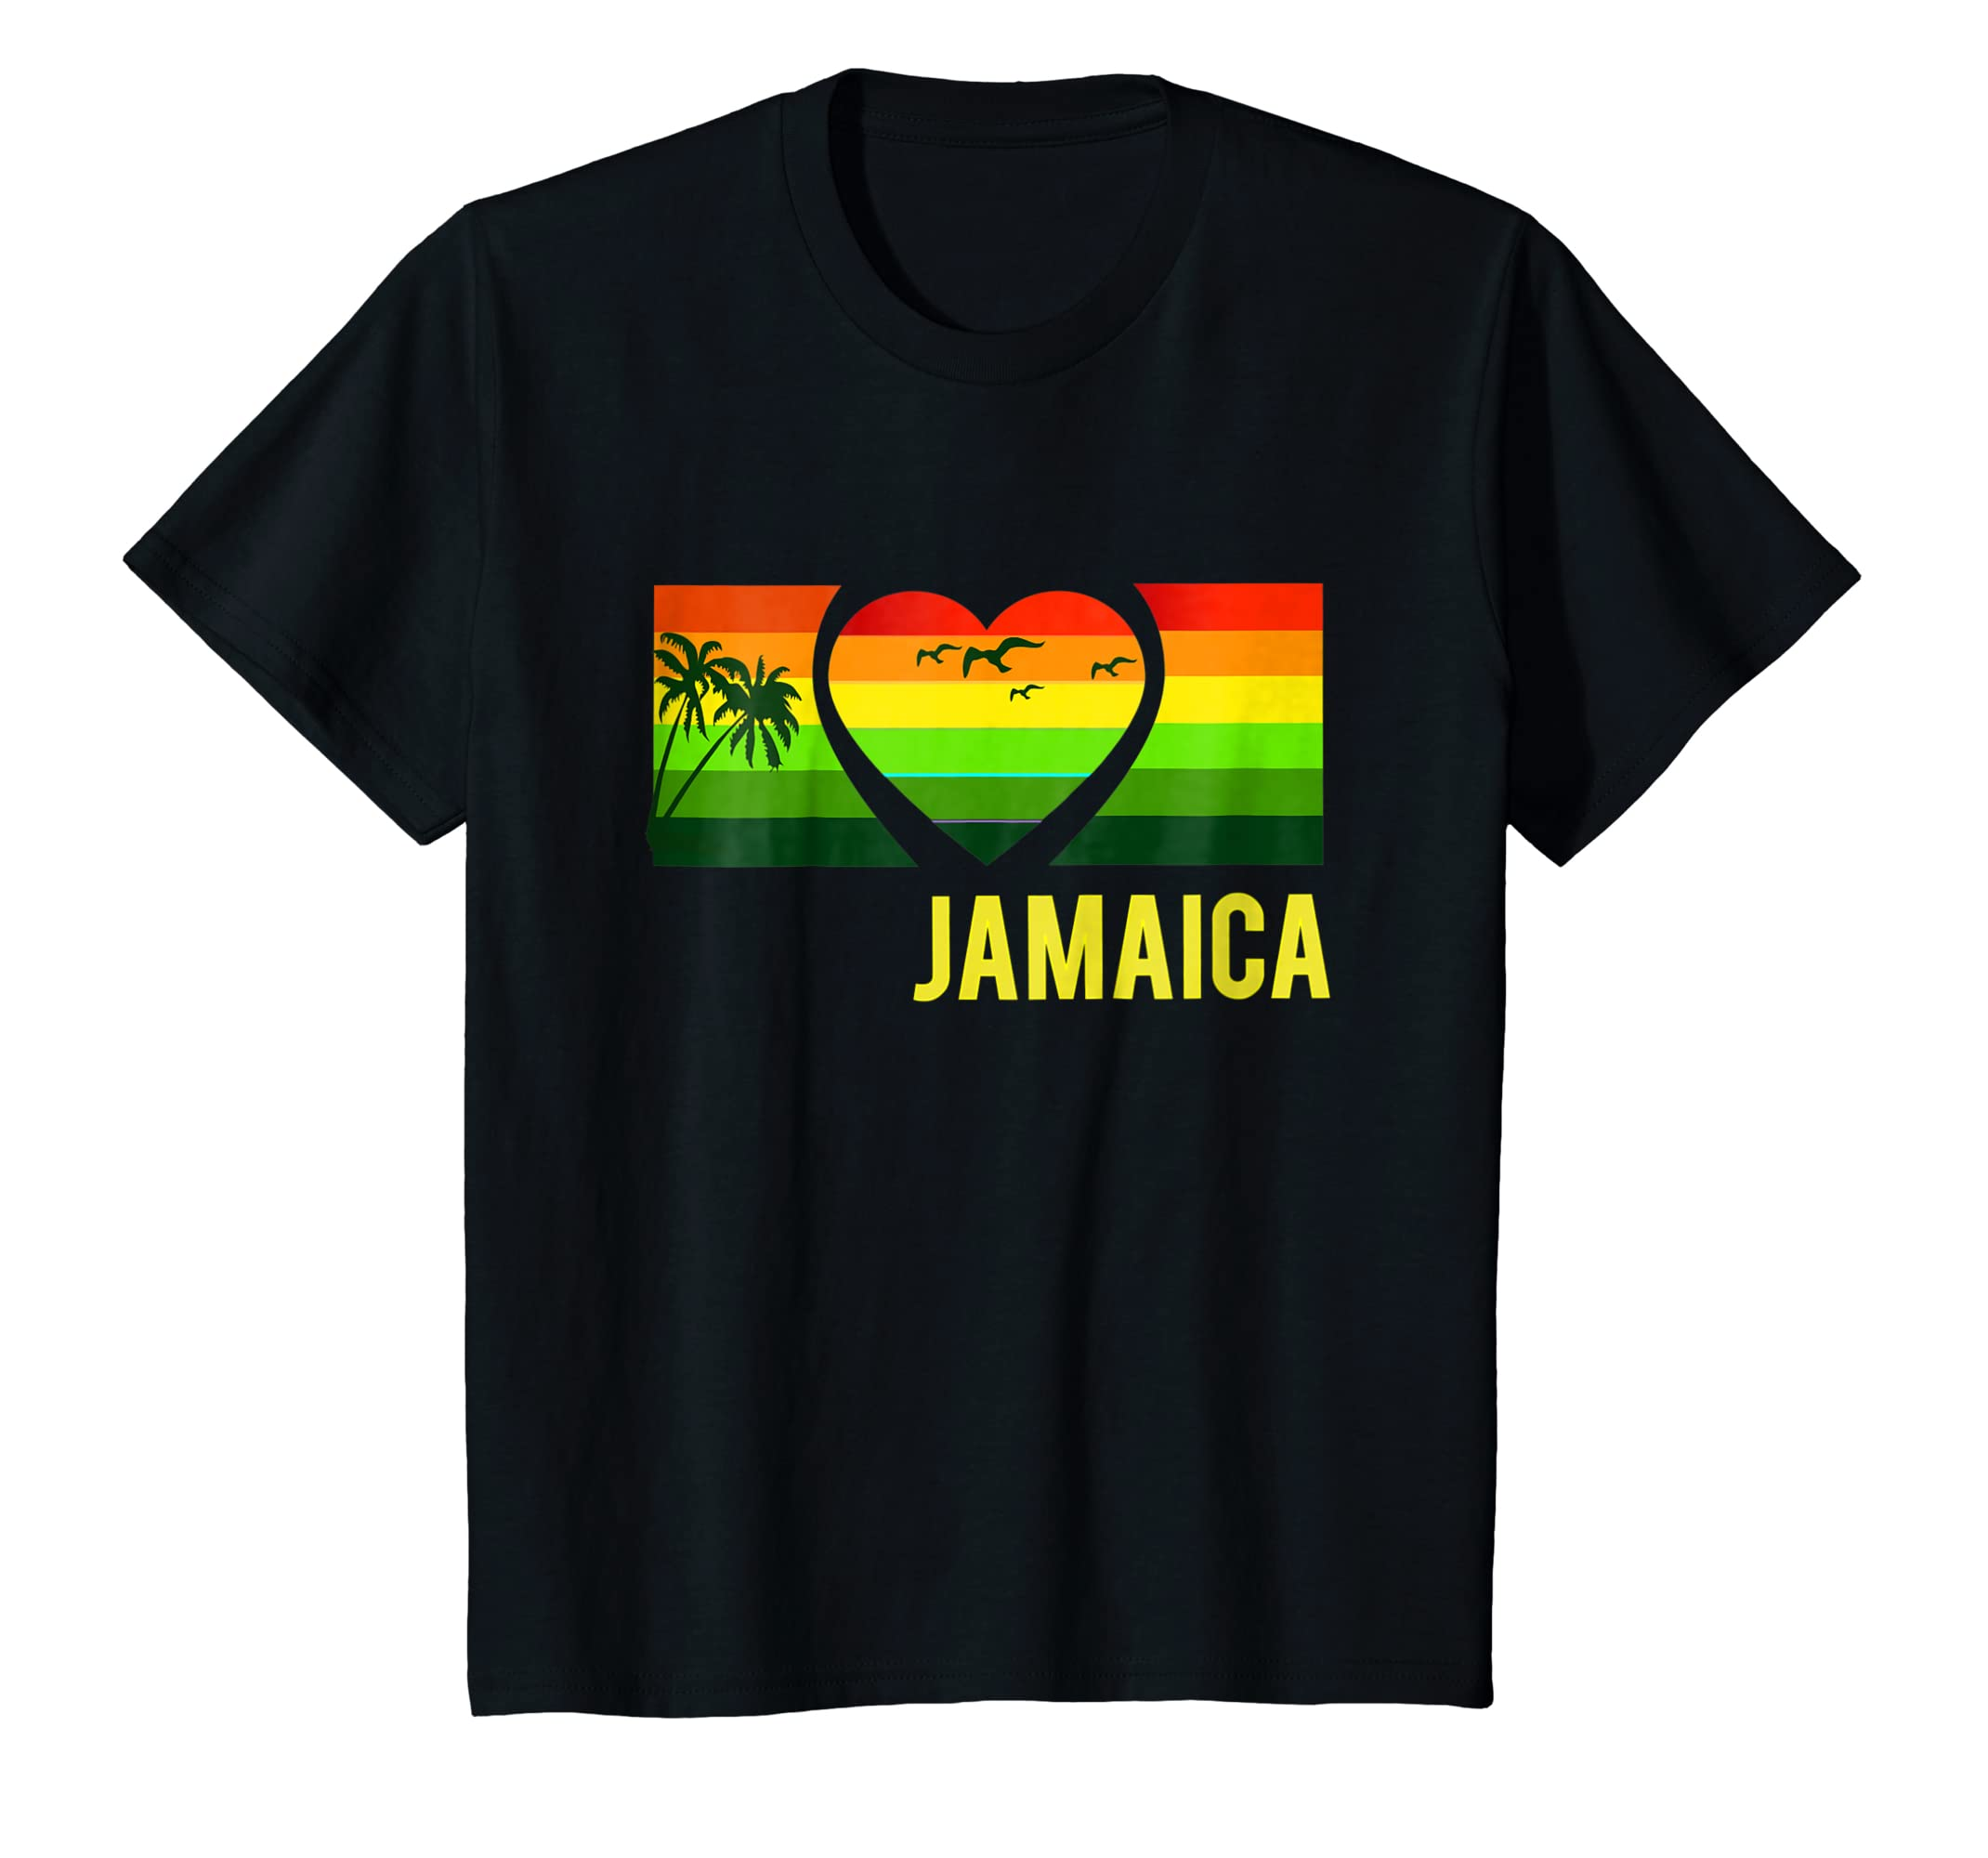 Amazon.com  Sunset Jamaican Vacation T-Shirt Rasta Reggae Style Shirt   Clothing 0a3ea1a5a